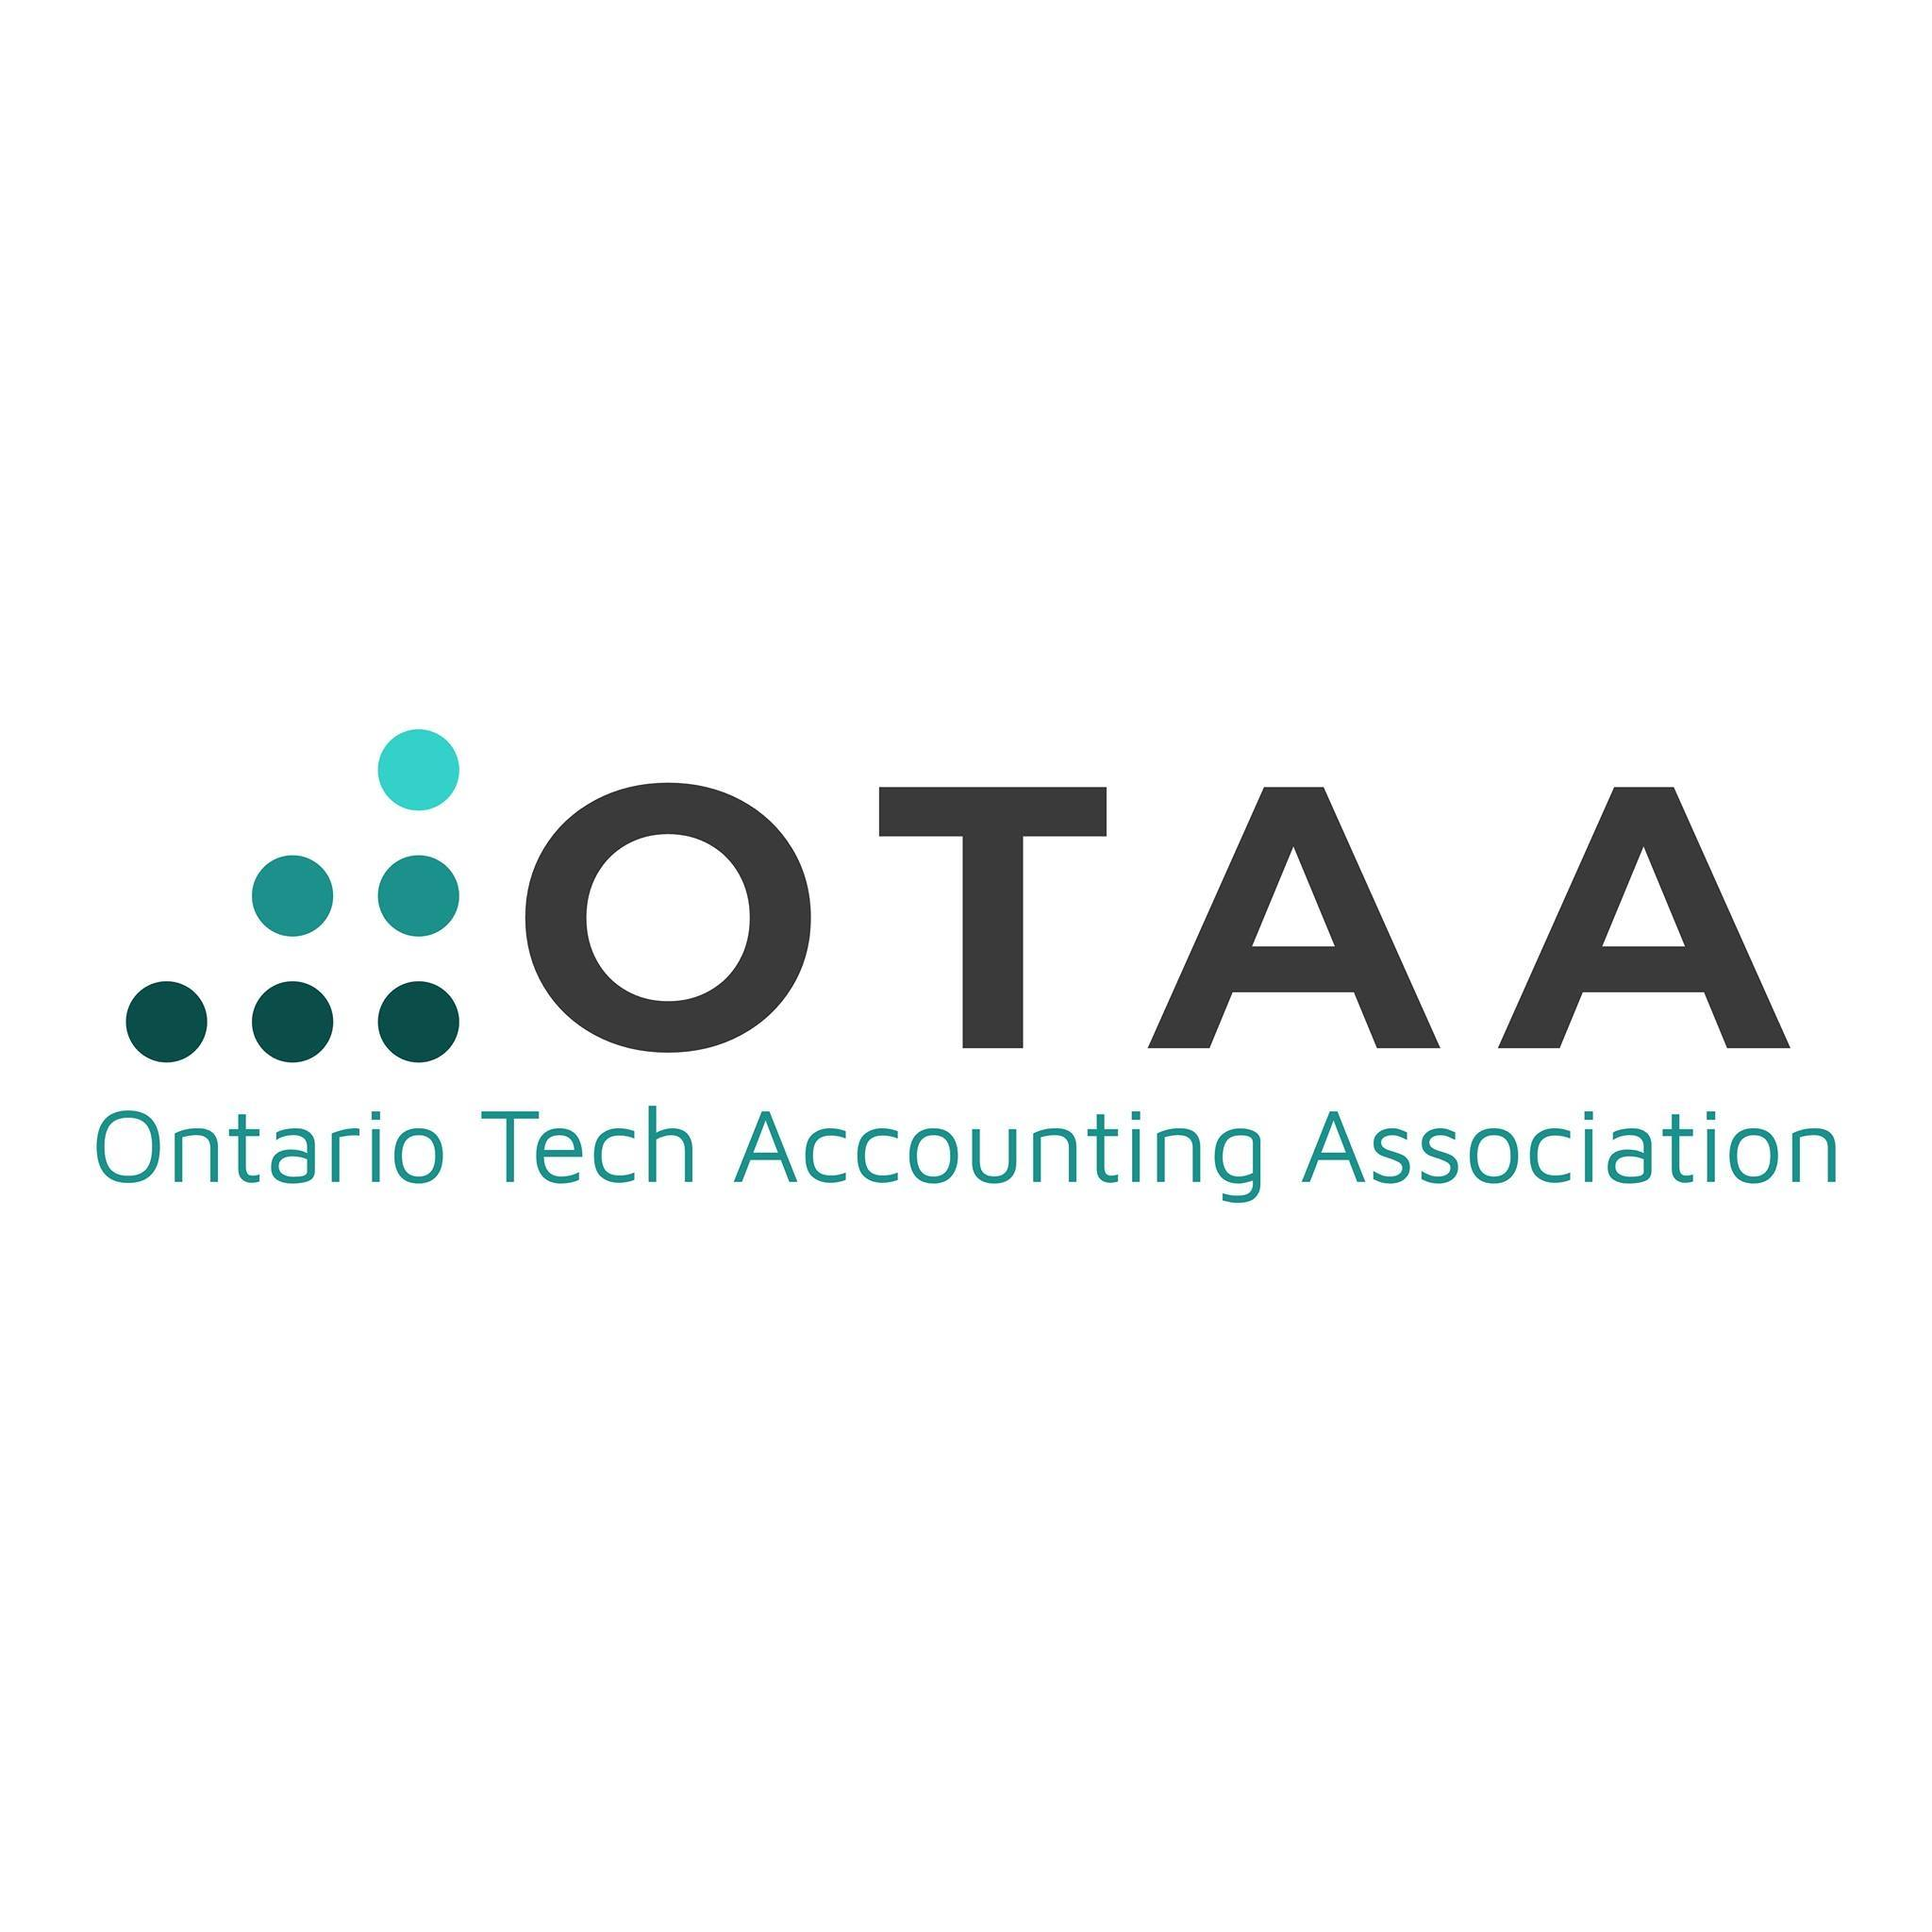 Accounting Association